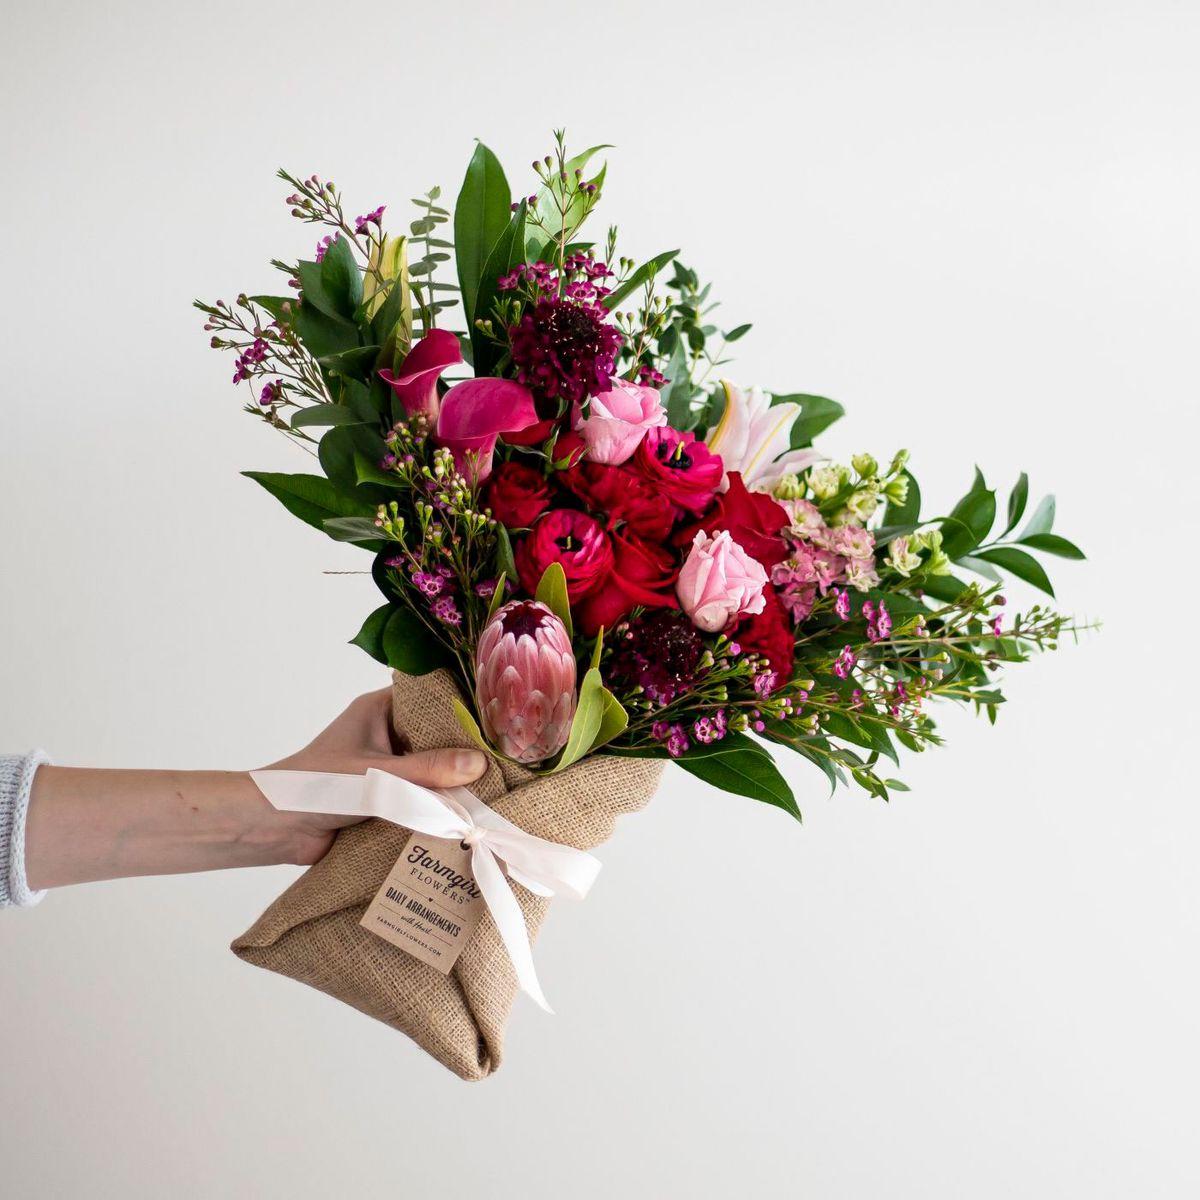 20 Best Valentine S Day Flowers To Buy Online 2021 The Strategist New York Magazine